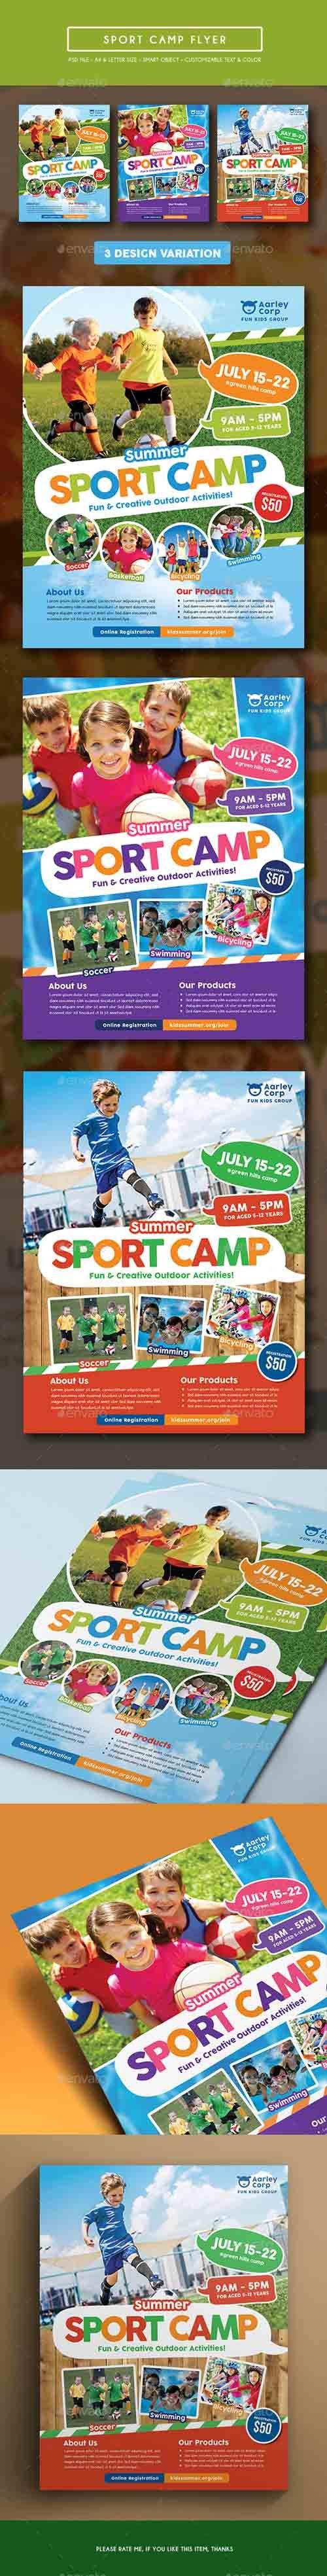 Sport Camp Flyer 15373514 » HeroGFX Graphic Design   Flyer - Broşür ...